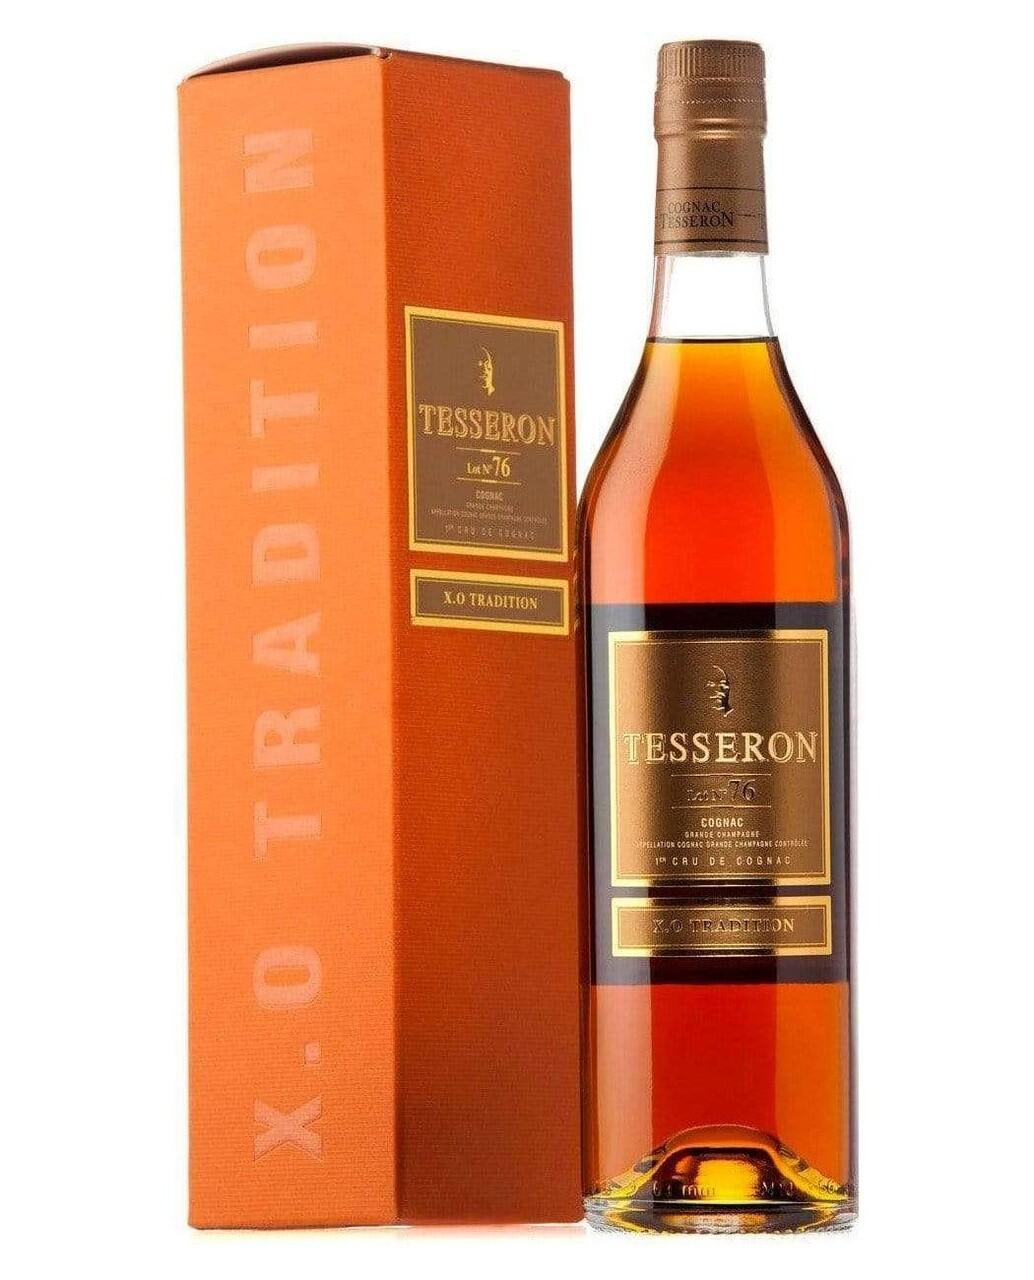 Cognac Tesseron Lot 76